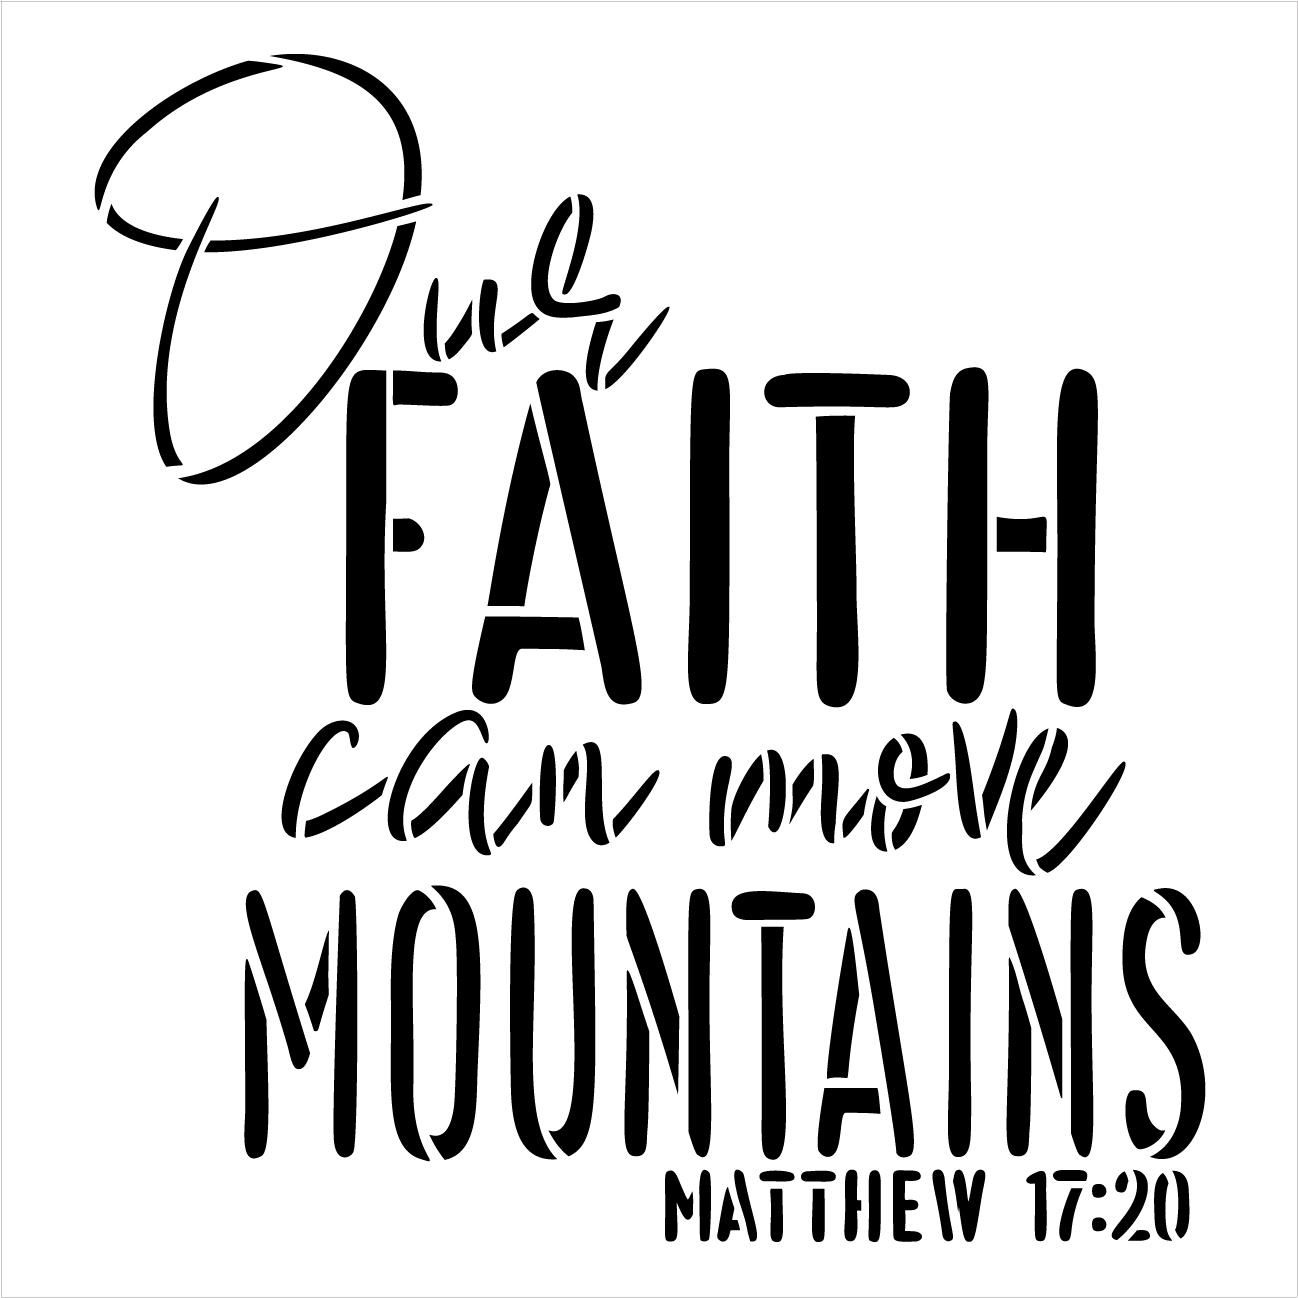 Matthew 17:20 Stencil by StudioR12 | Faith Can Move Mountains | DIY Gift Cursive Christian Inspiration | Craft Faith Bible Verse | Paint Wood Sign | Reusable Mylar Template | Select Size